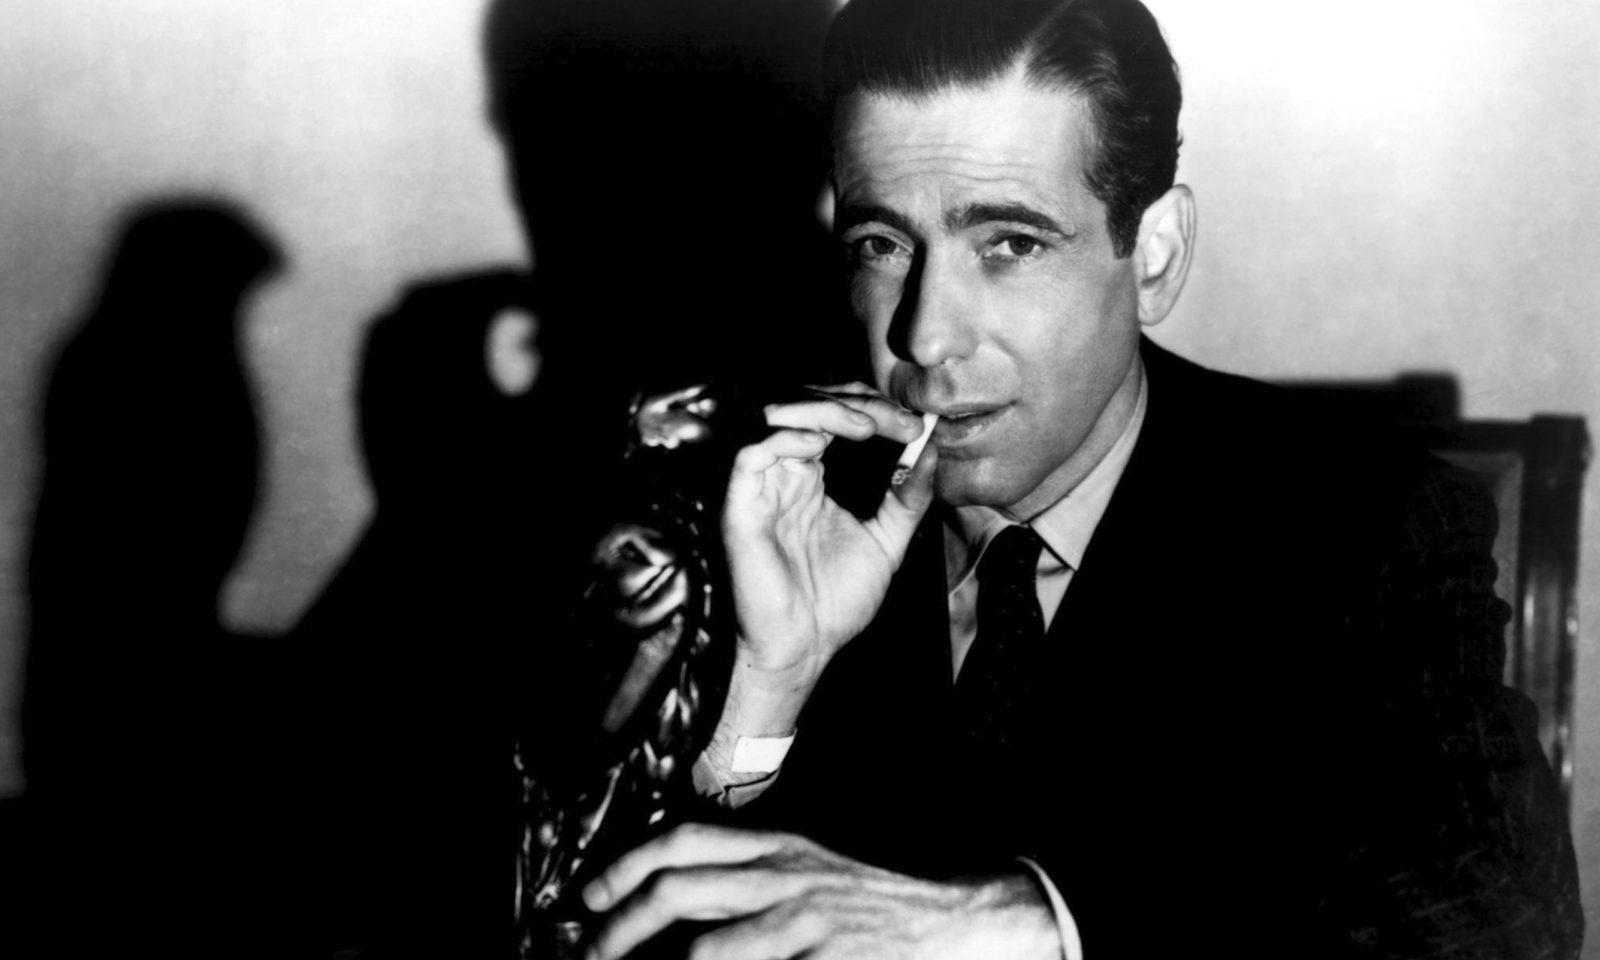 La cigarette interdite au cinéma ou la bonne attitude néo-moralisatrice